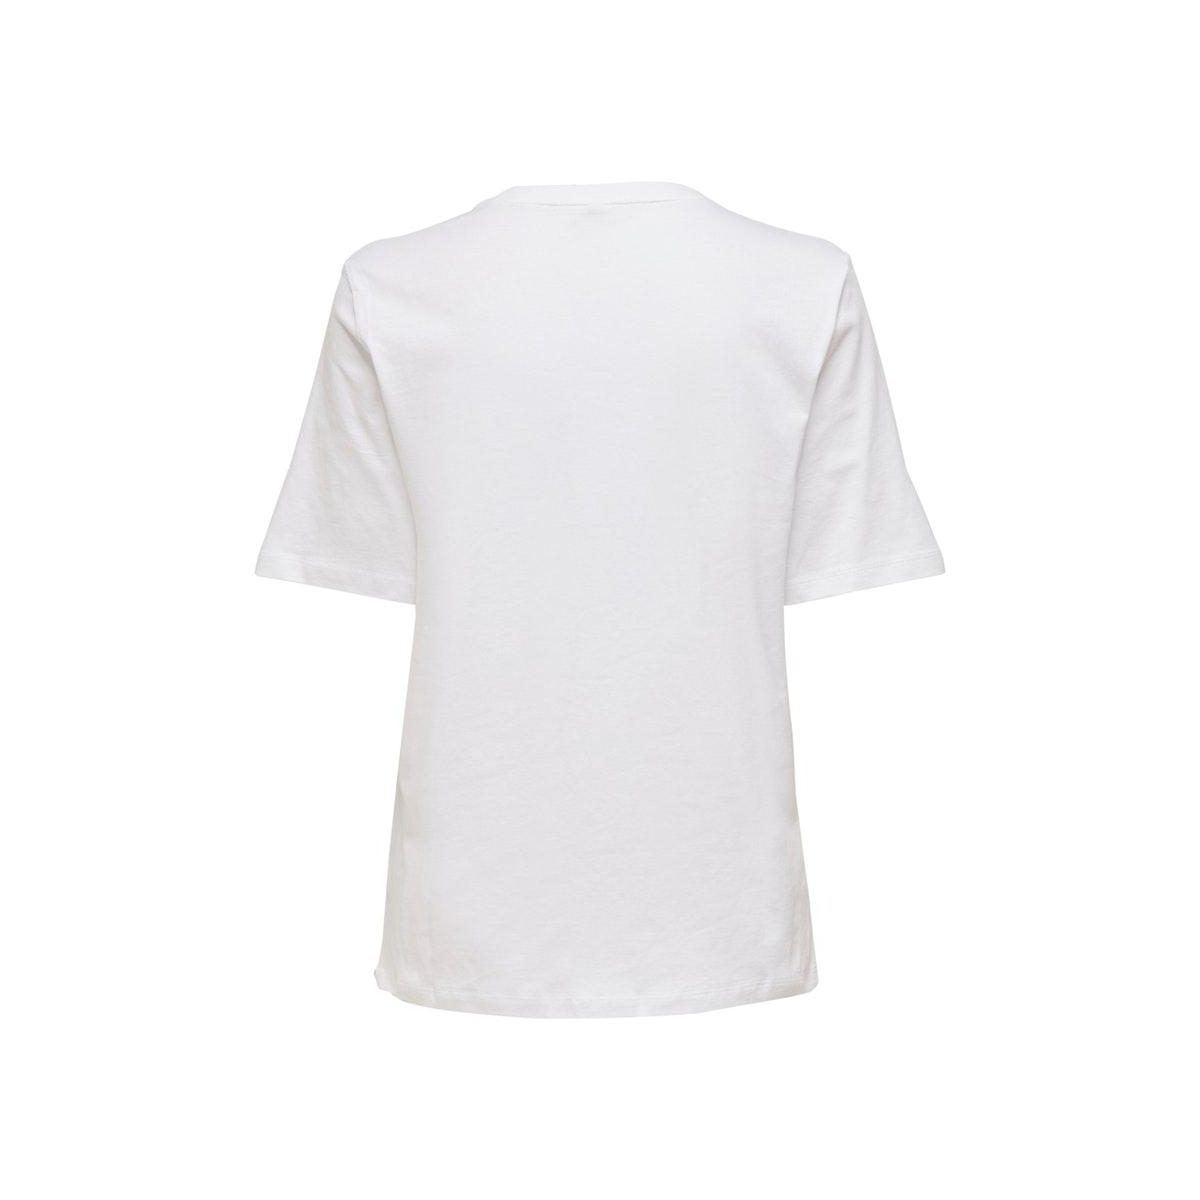 onlkita life boxy s/s world top box 15199873 only t-shirt bright white